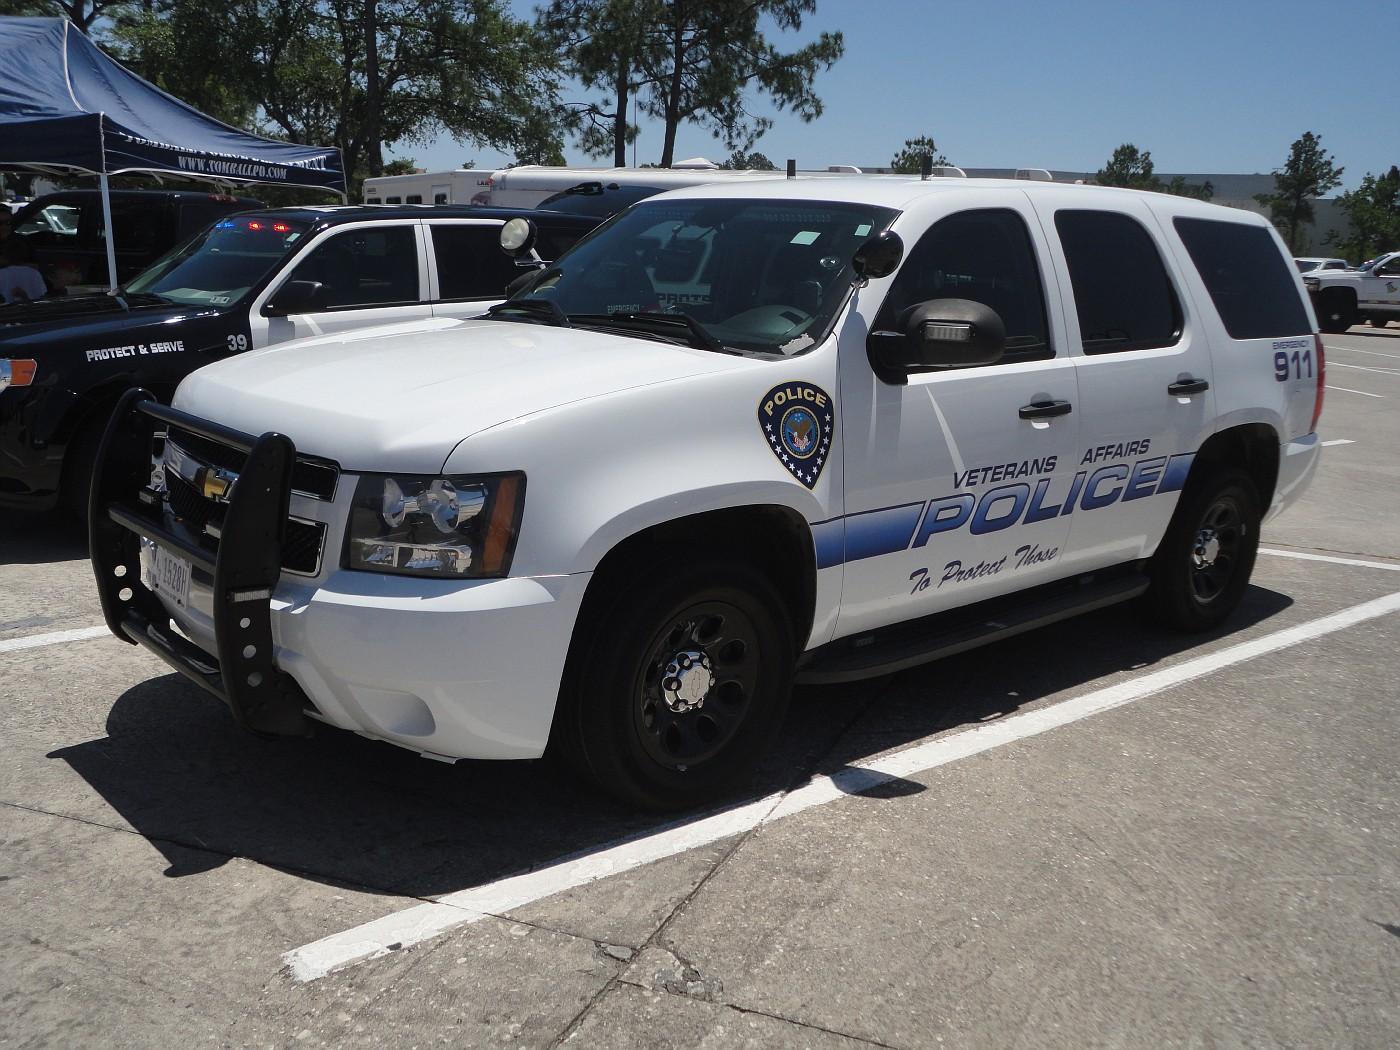 department of veterans affairs police